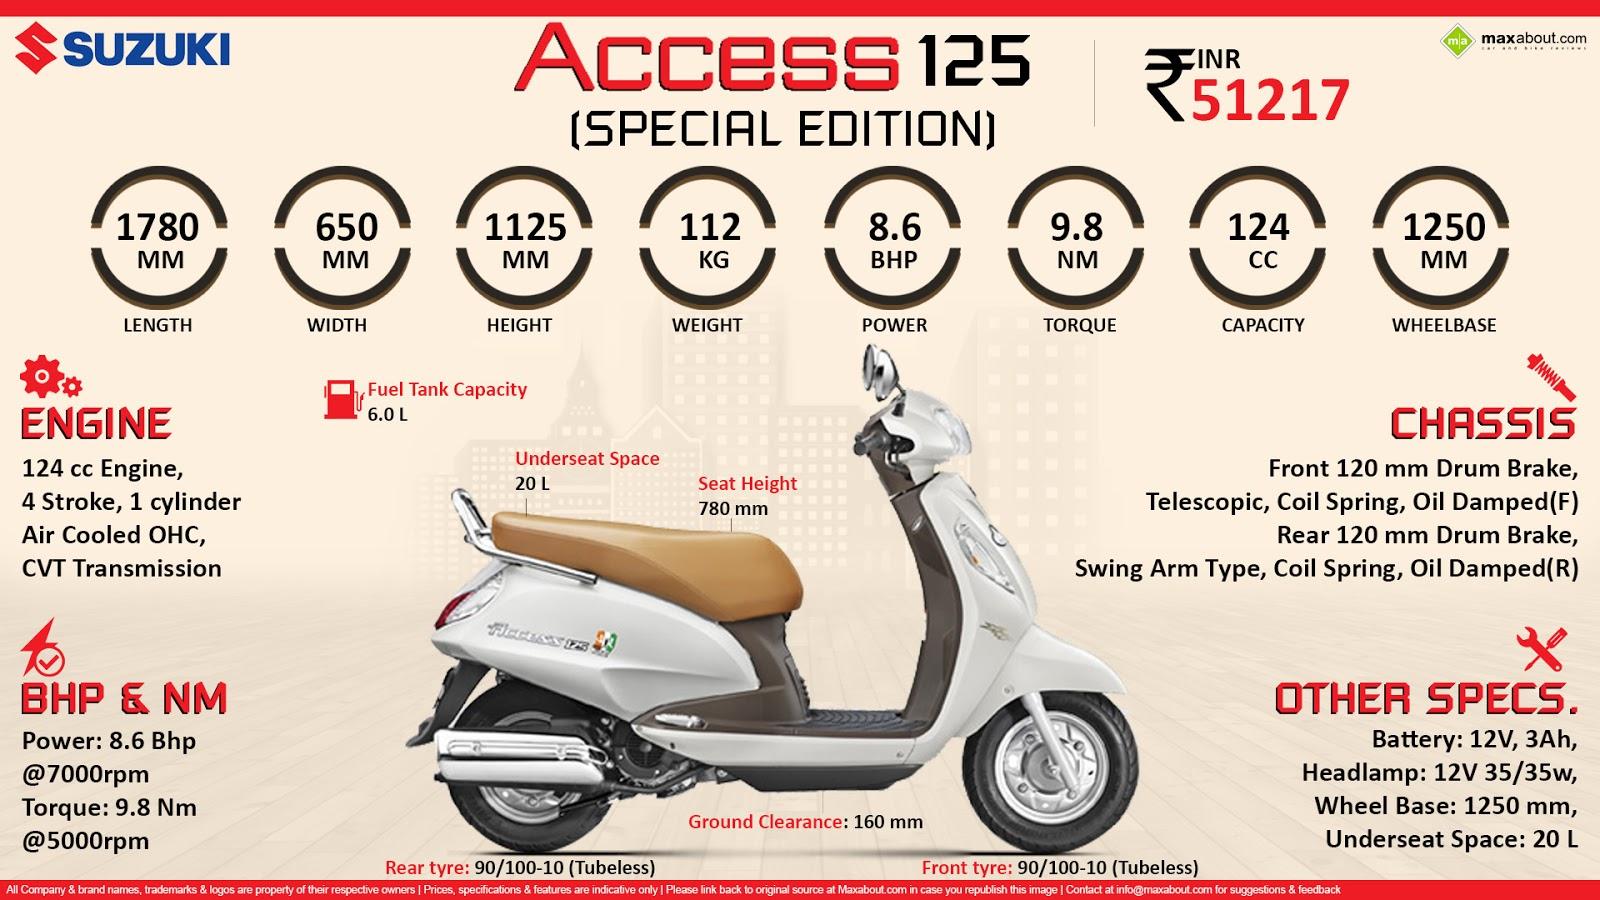 suzuki access 125 special edition disc images